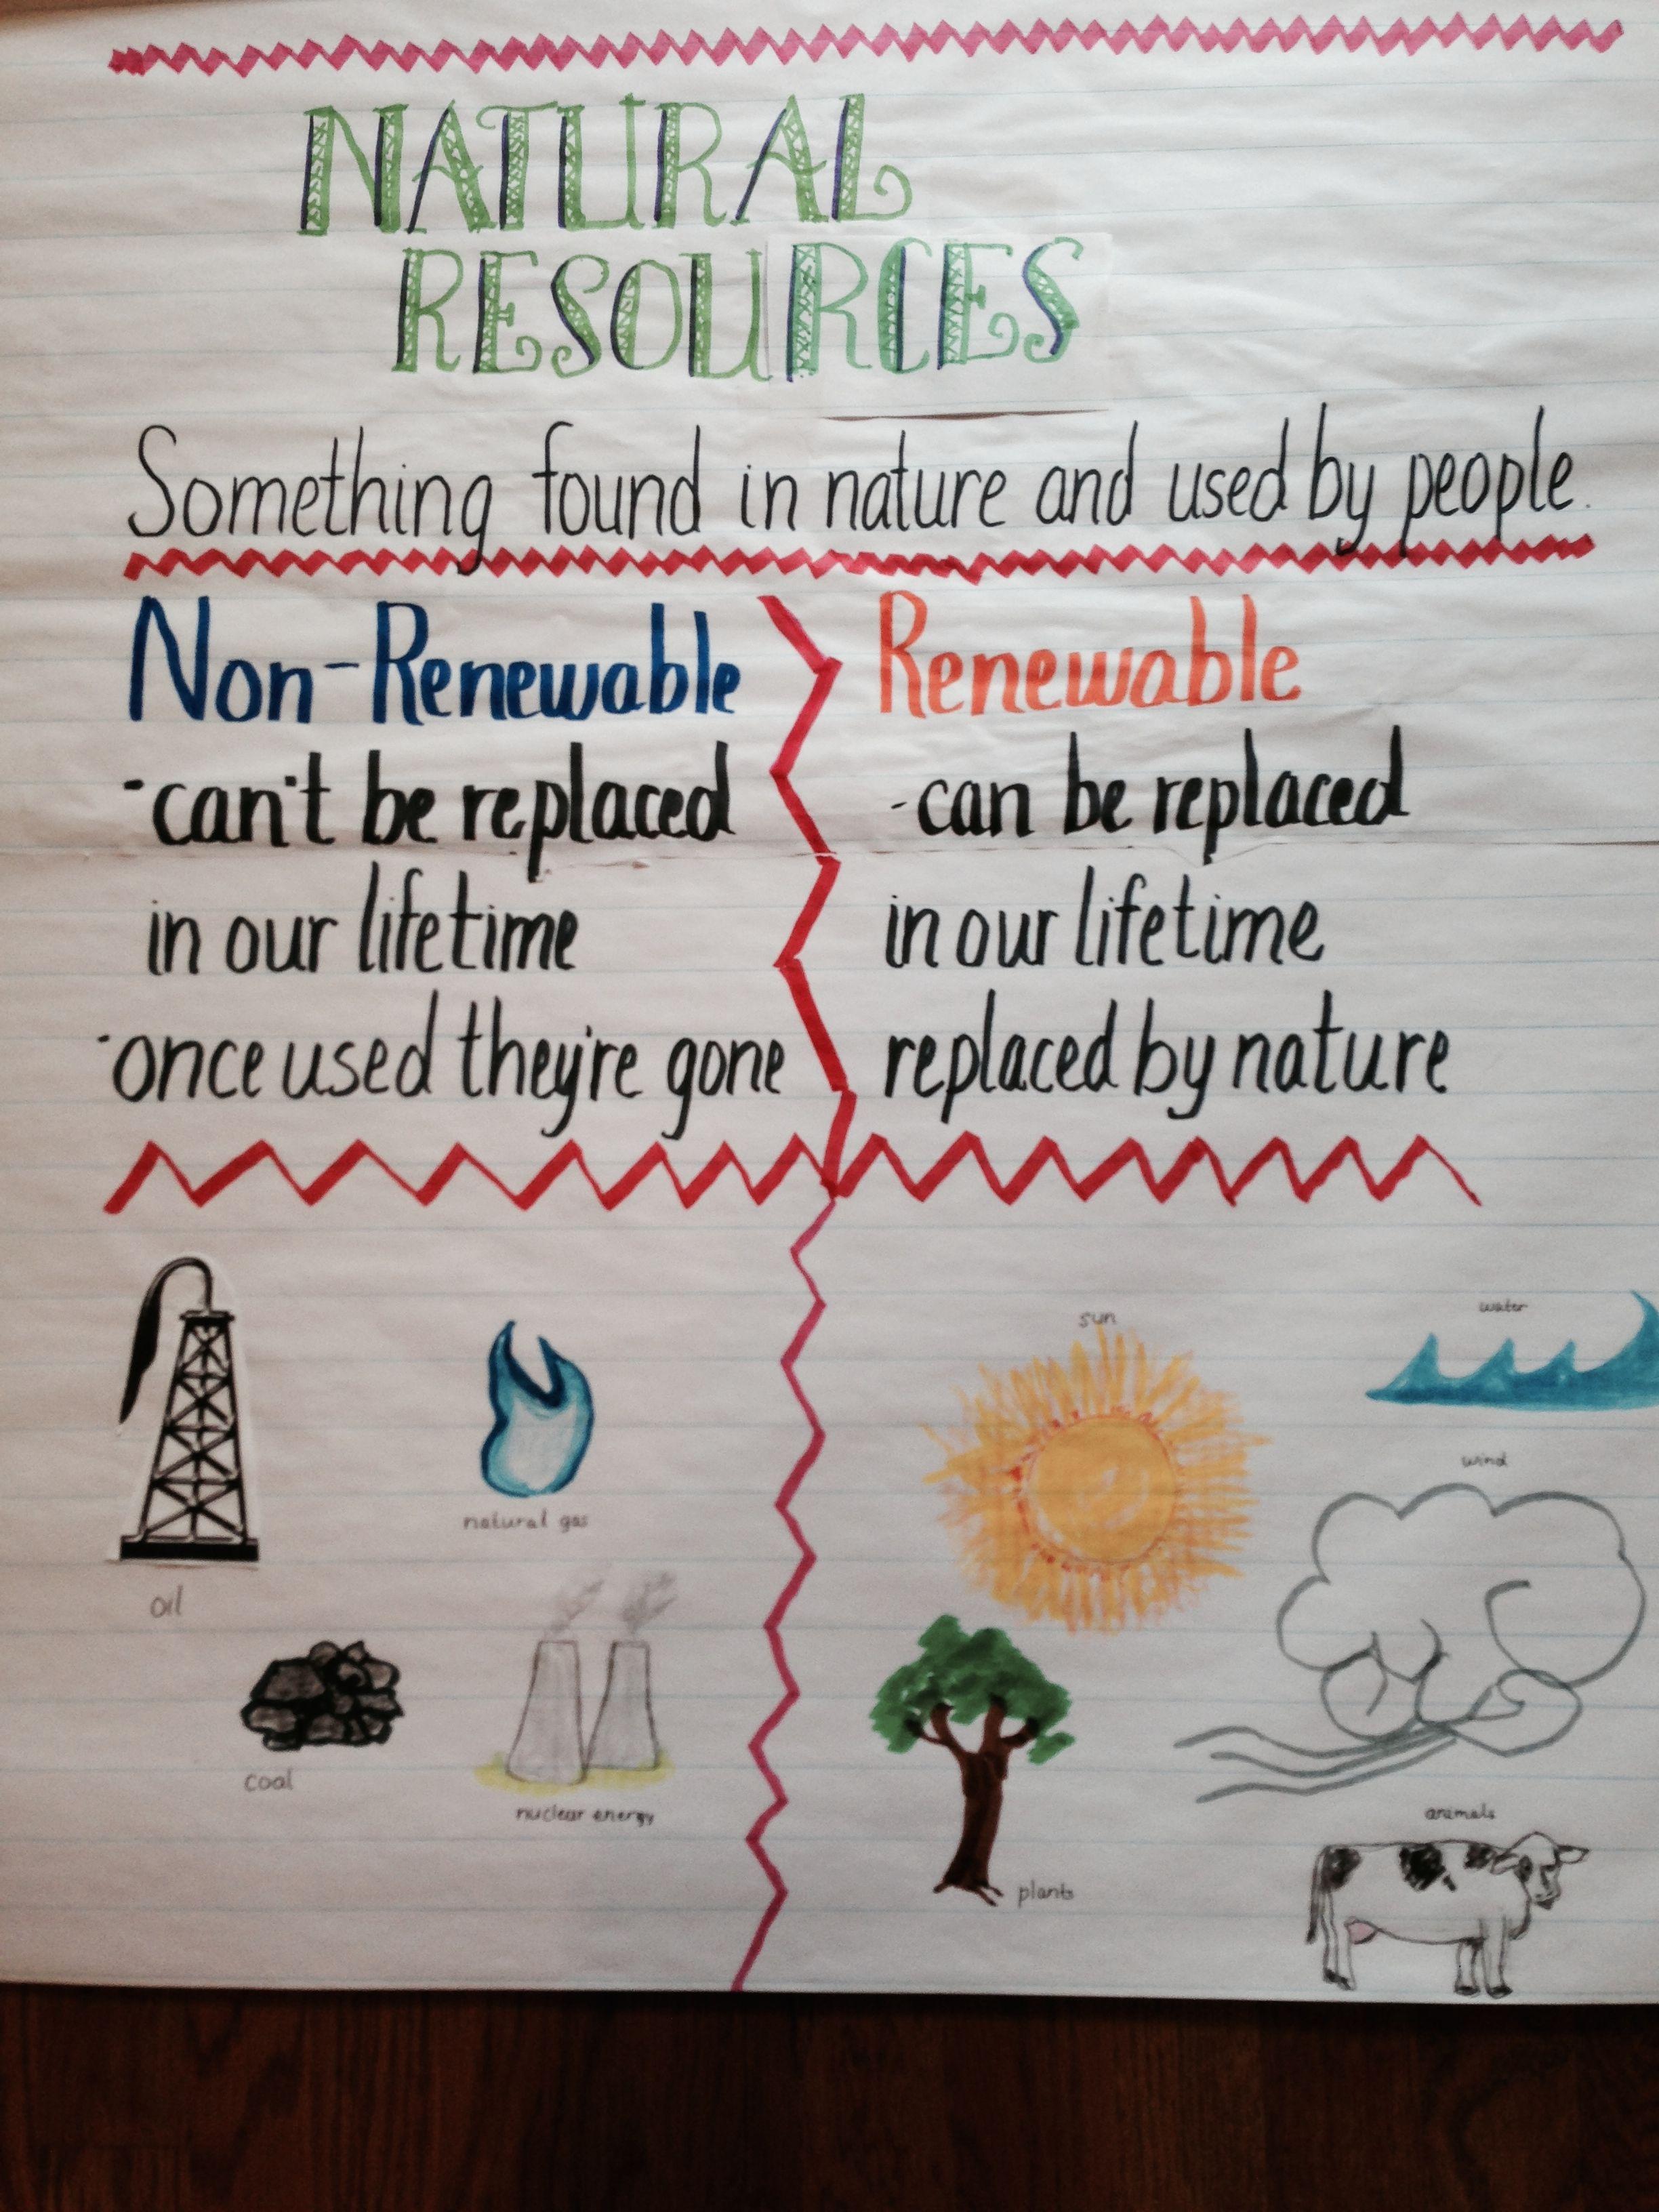 medium resolution of 36 Natural resources ideas   nonrenewable resources